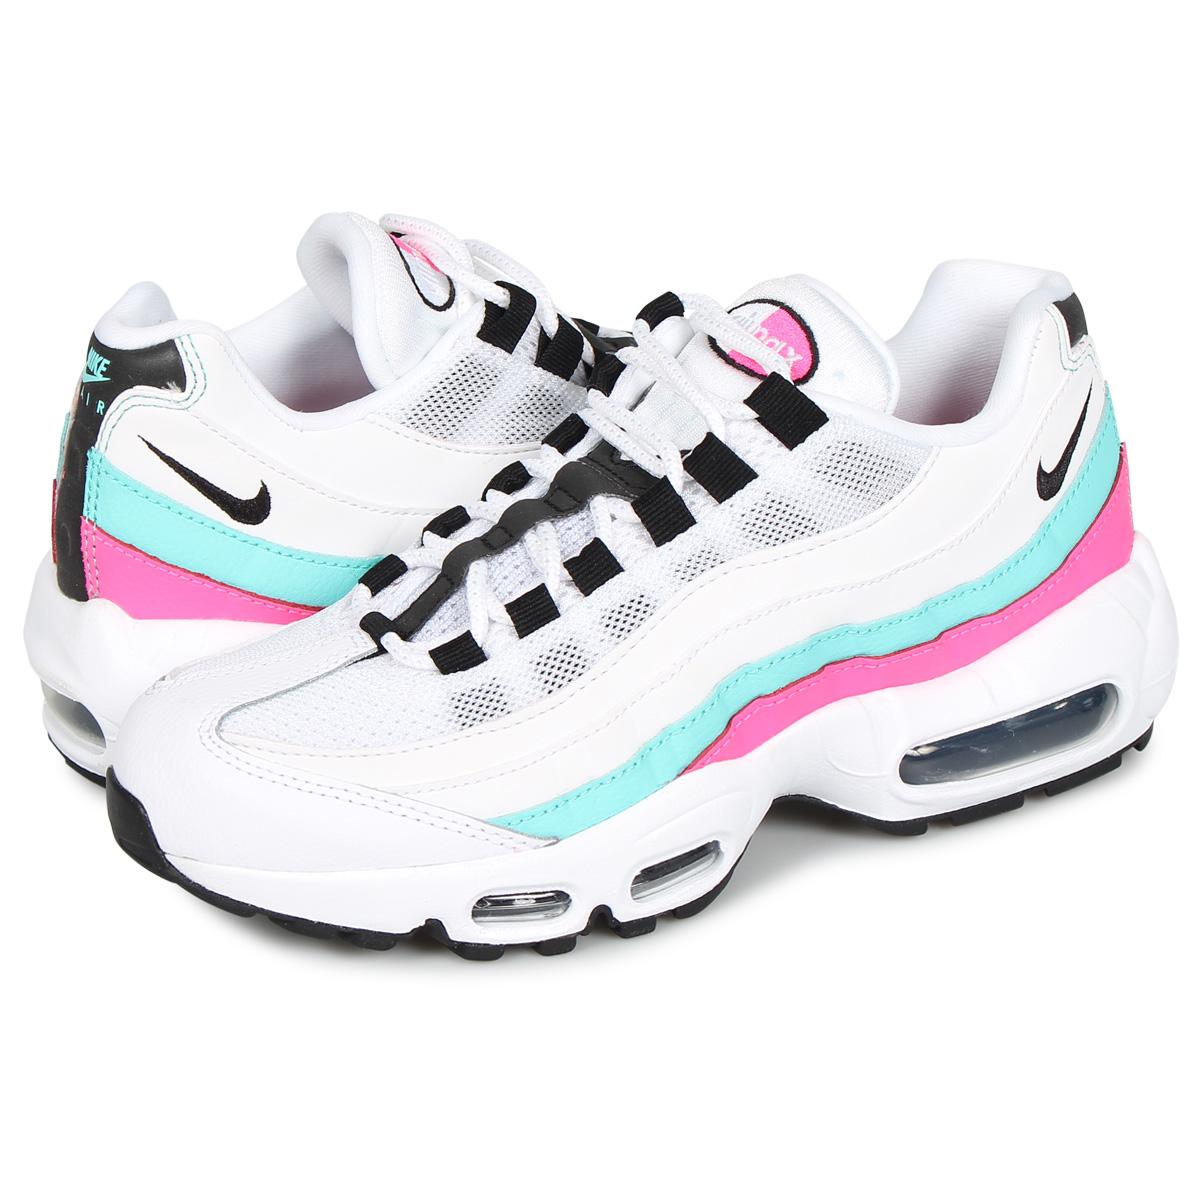 Nike NIKE Air Max 95 sneakers men gap Dis WMNS AIR MAX 95 white white 307,960 117 [the 1121 additional arrival]